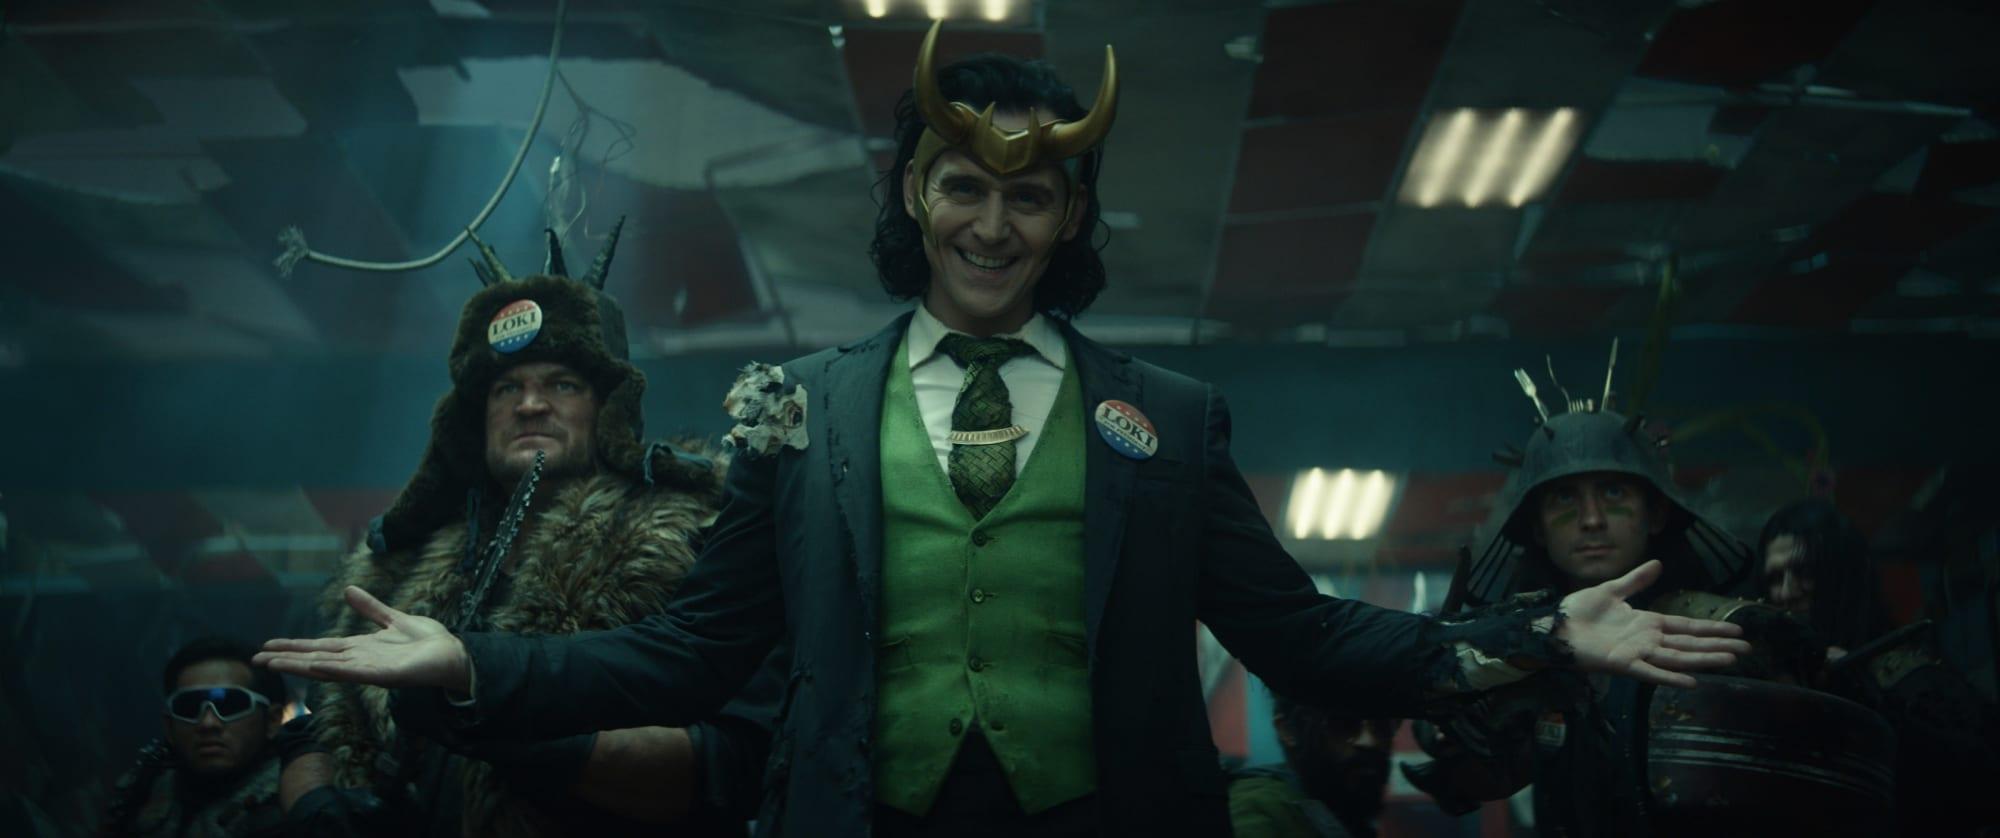 Watch Loki season 1, episode 3 trailer